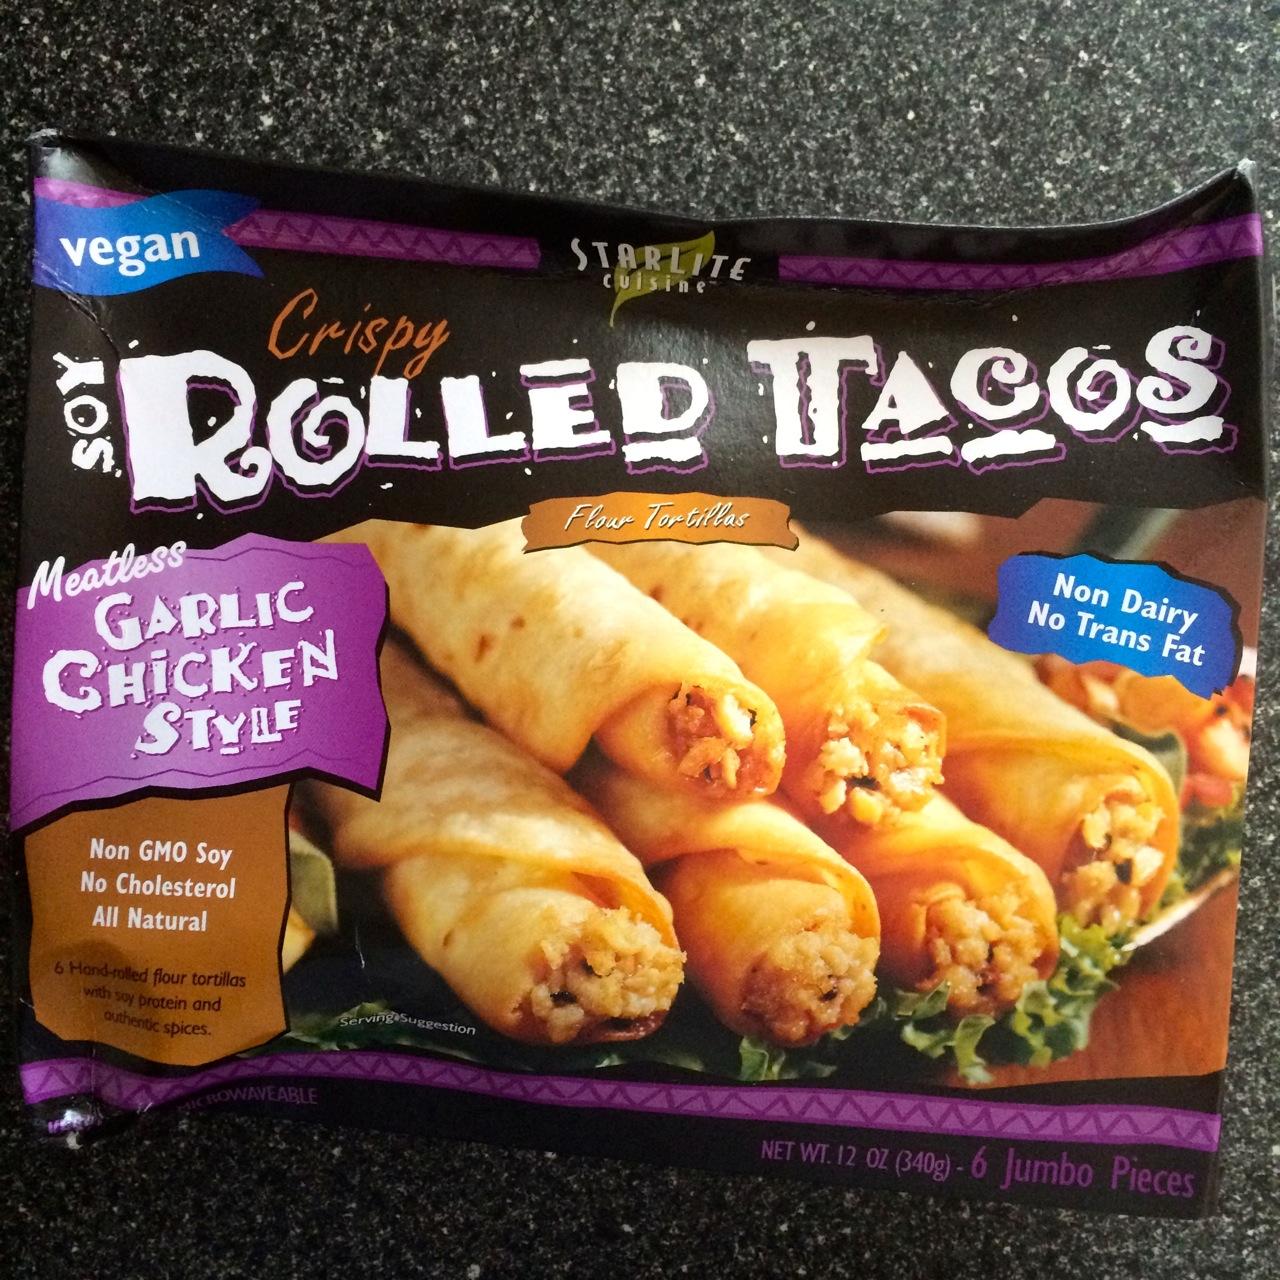 http://i1.wp.com/fatgayvegan.com/wp-content/uploads/2015/06/starlite-cuisine-soy-rolled-tacos-garlic-chicken.jpg?fit=1280%2C1280